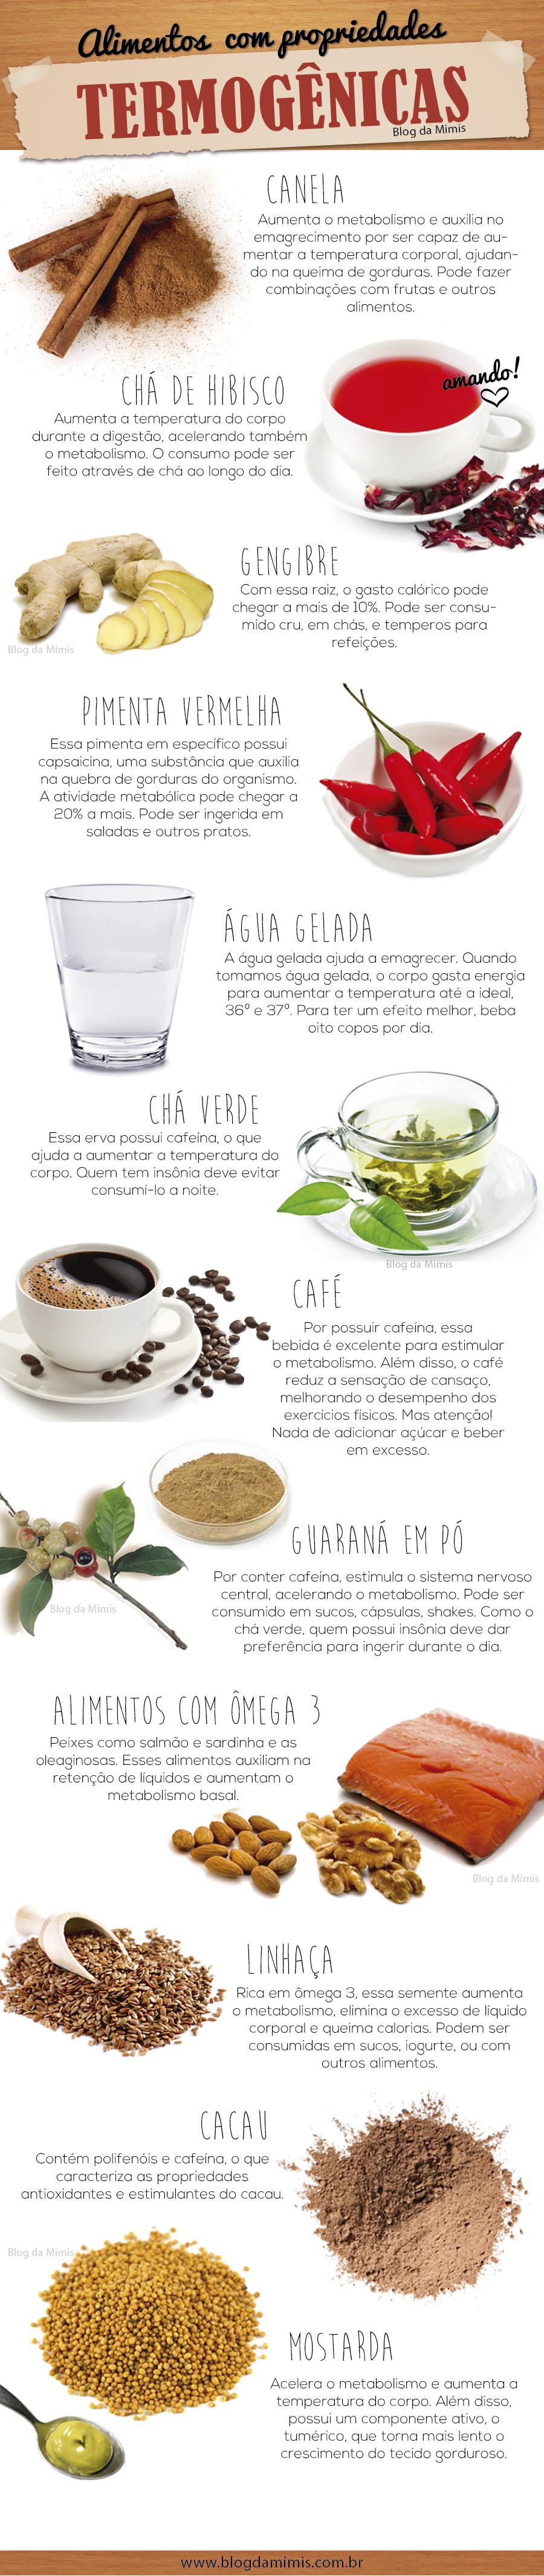 alimentos-termogênicos-blog-da-mimis-michelle-franzoni-01